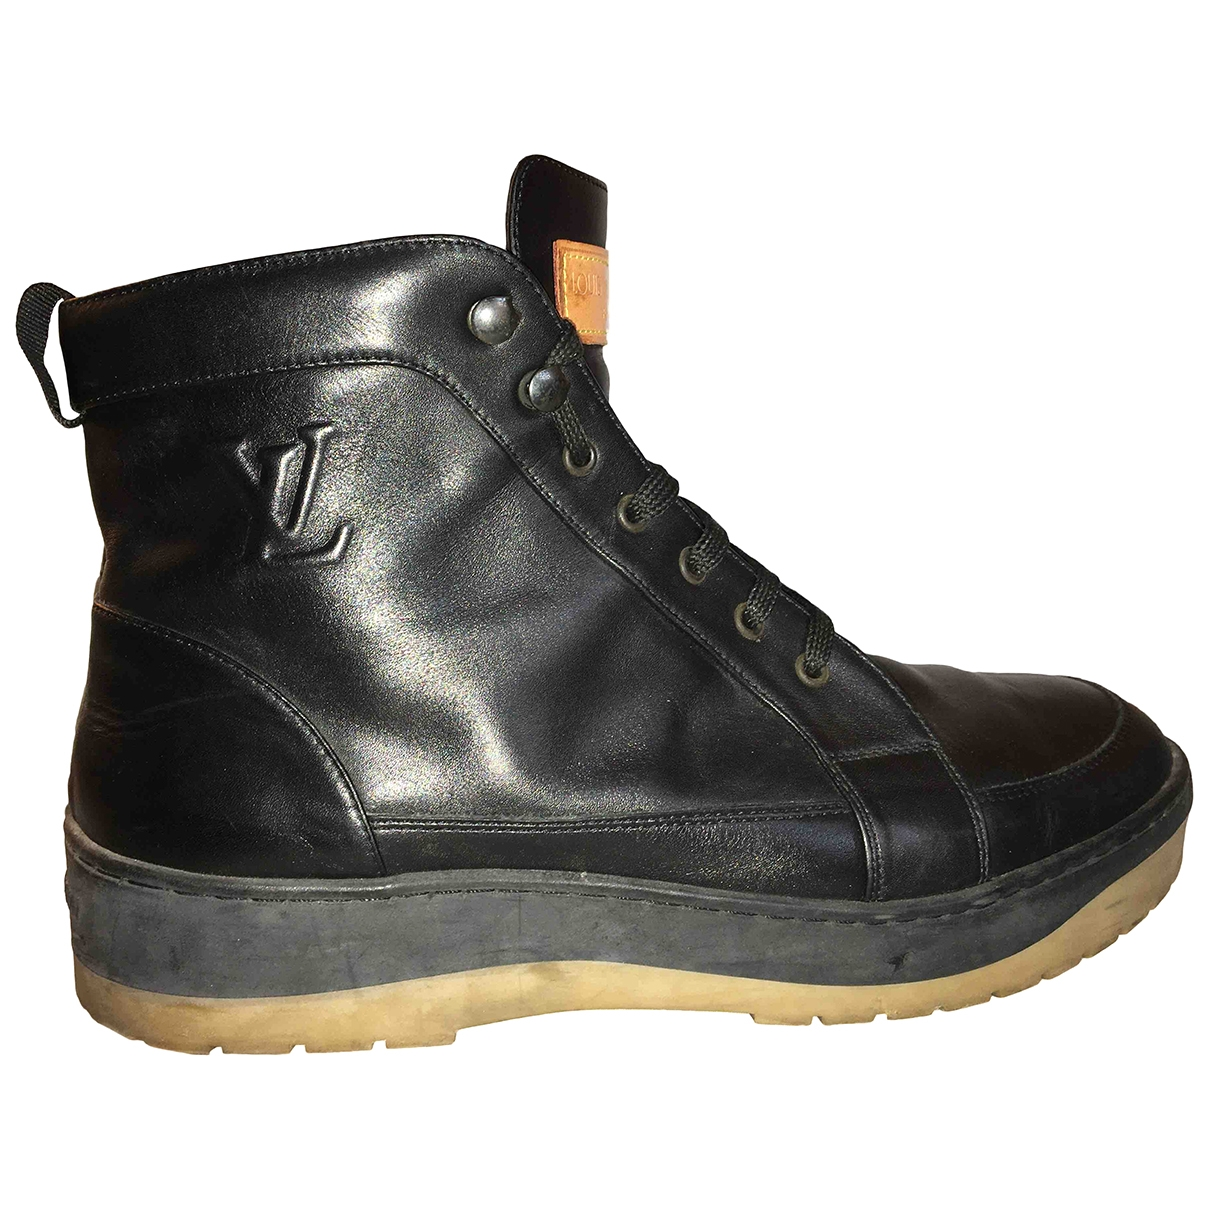 Louis Vuitton \N Black Leather Boots for Men 7.5 UK